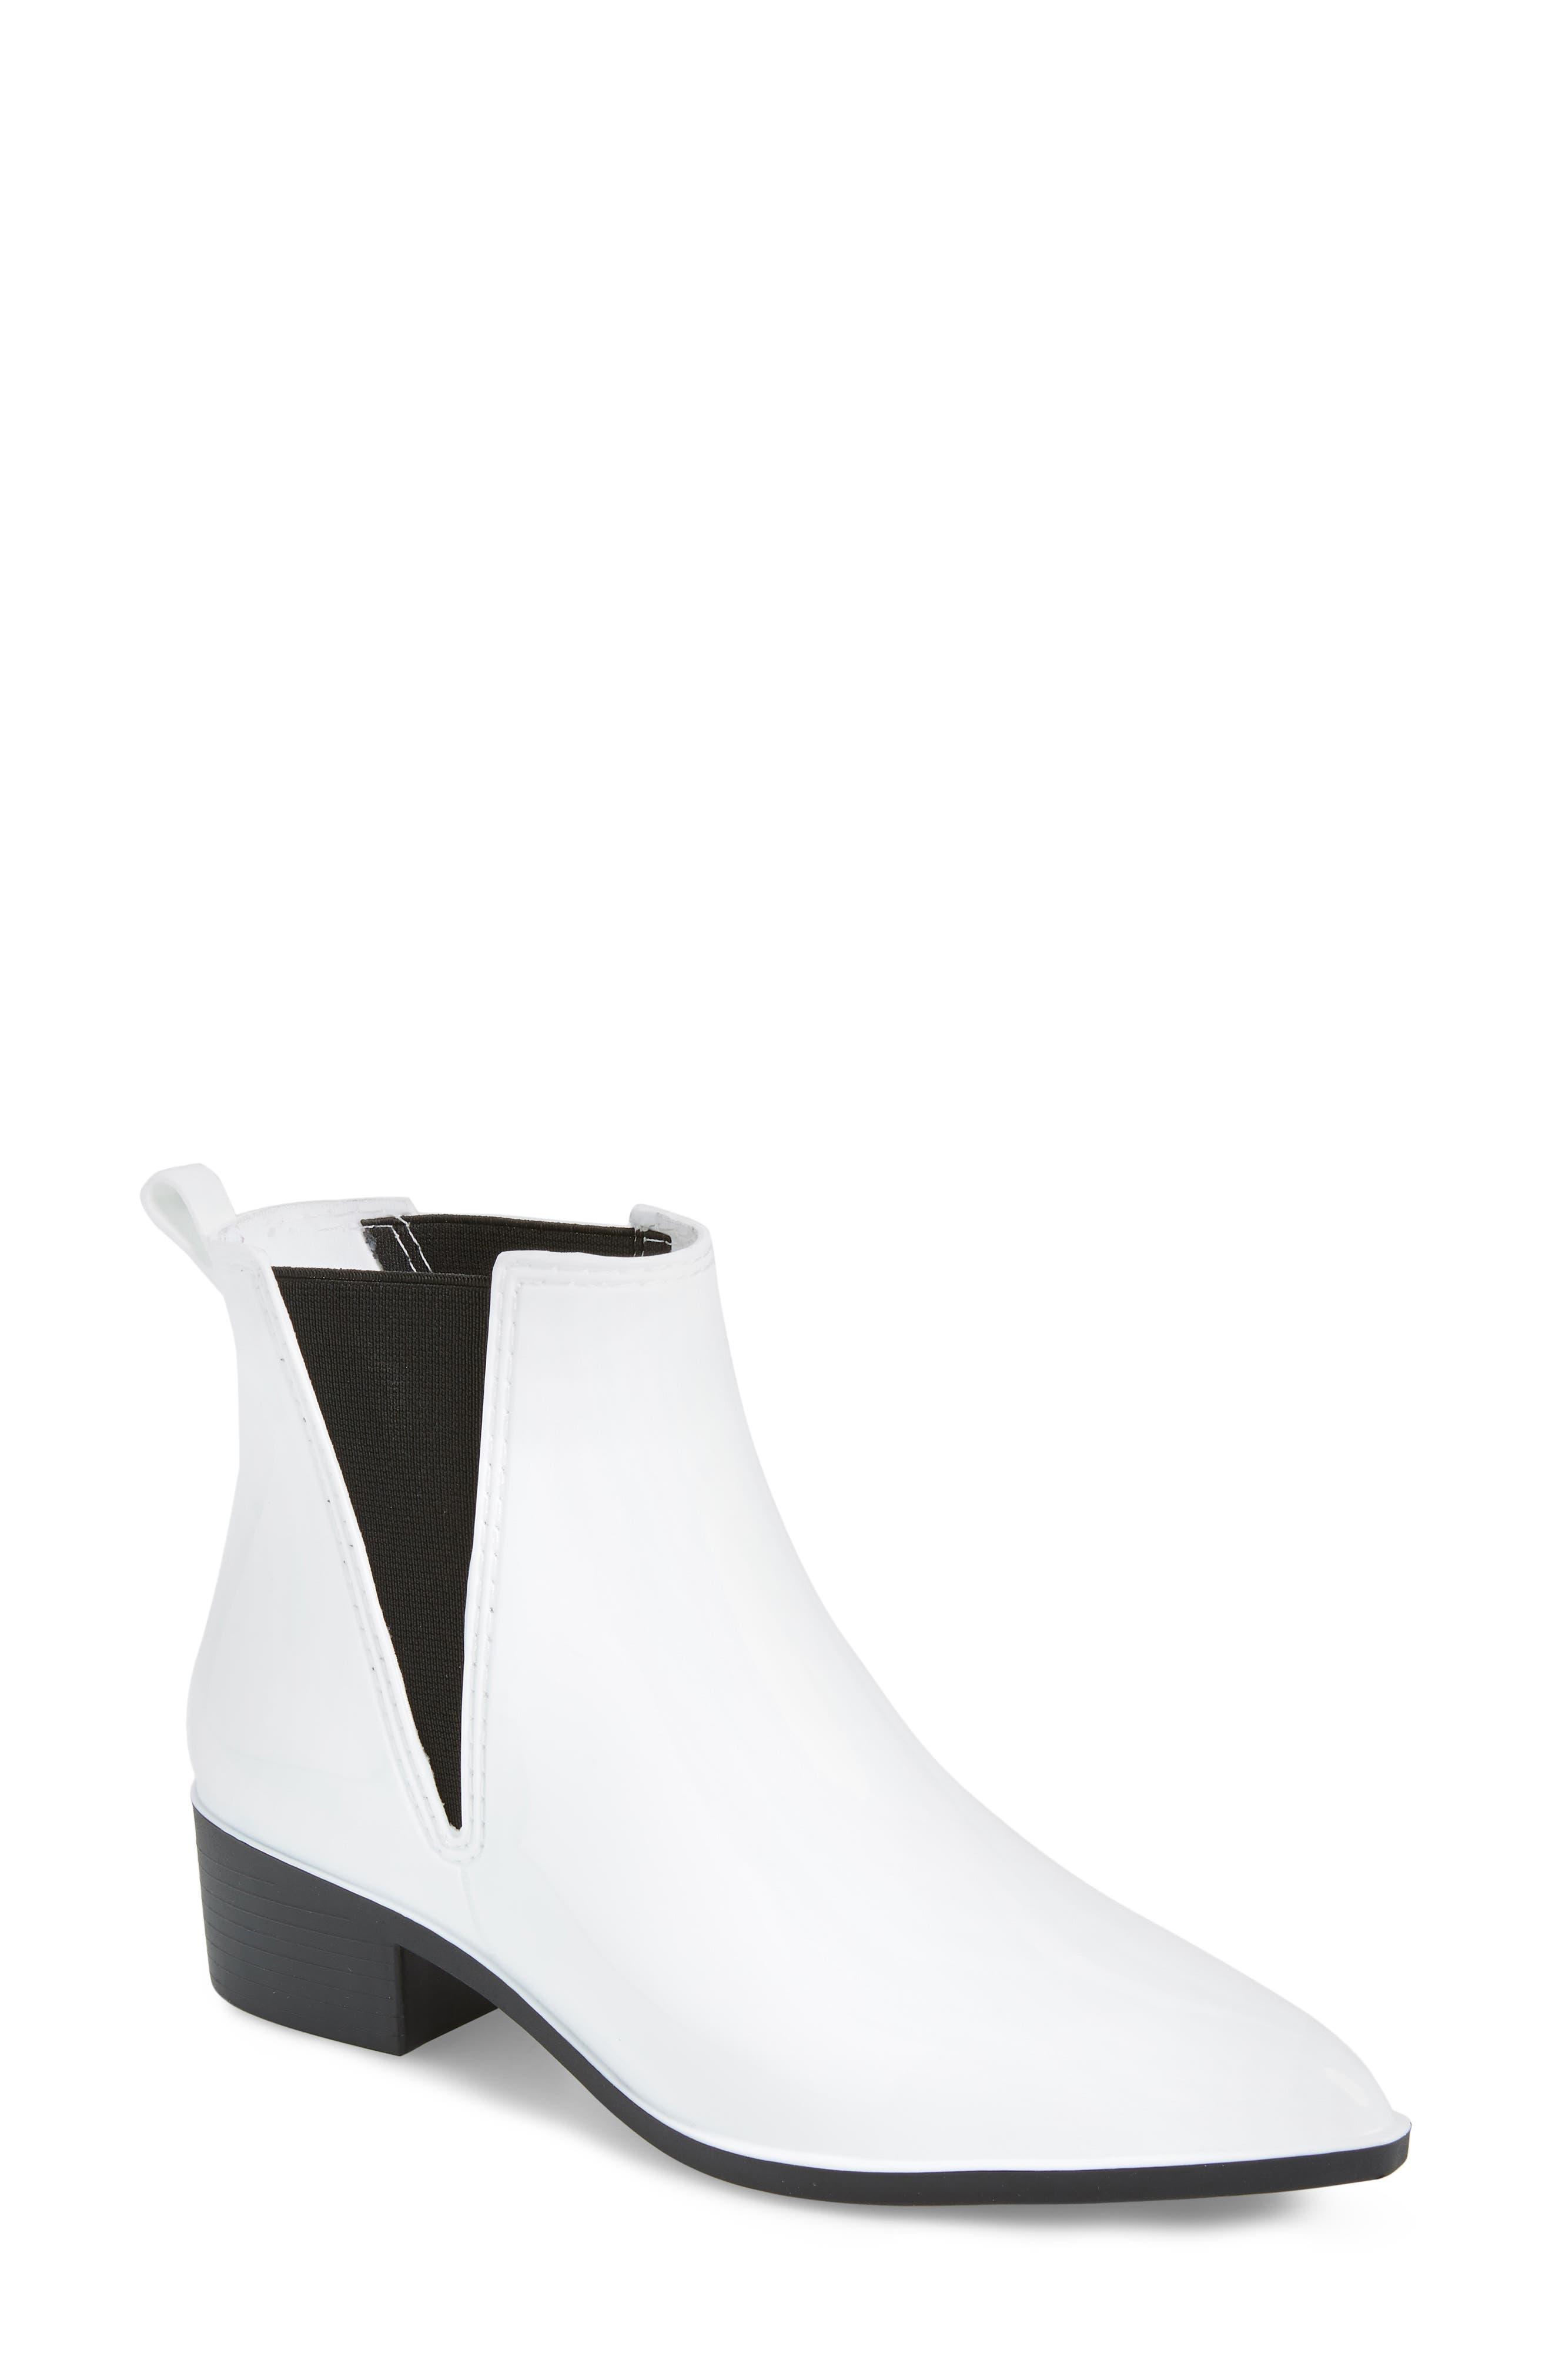 Jeffrey Campbell Mist Chelsea Waterproof Rain Boot, White